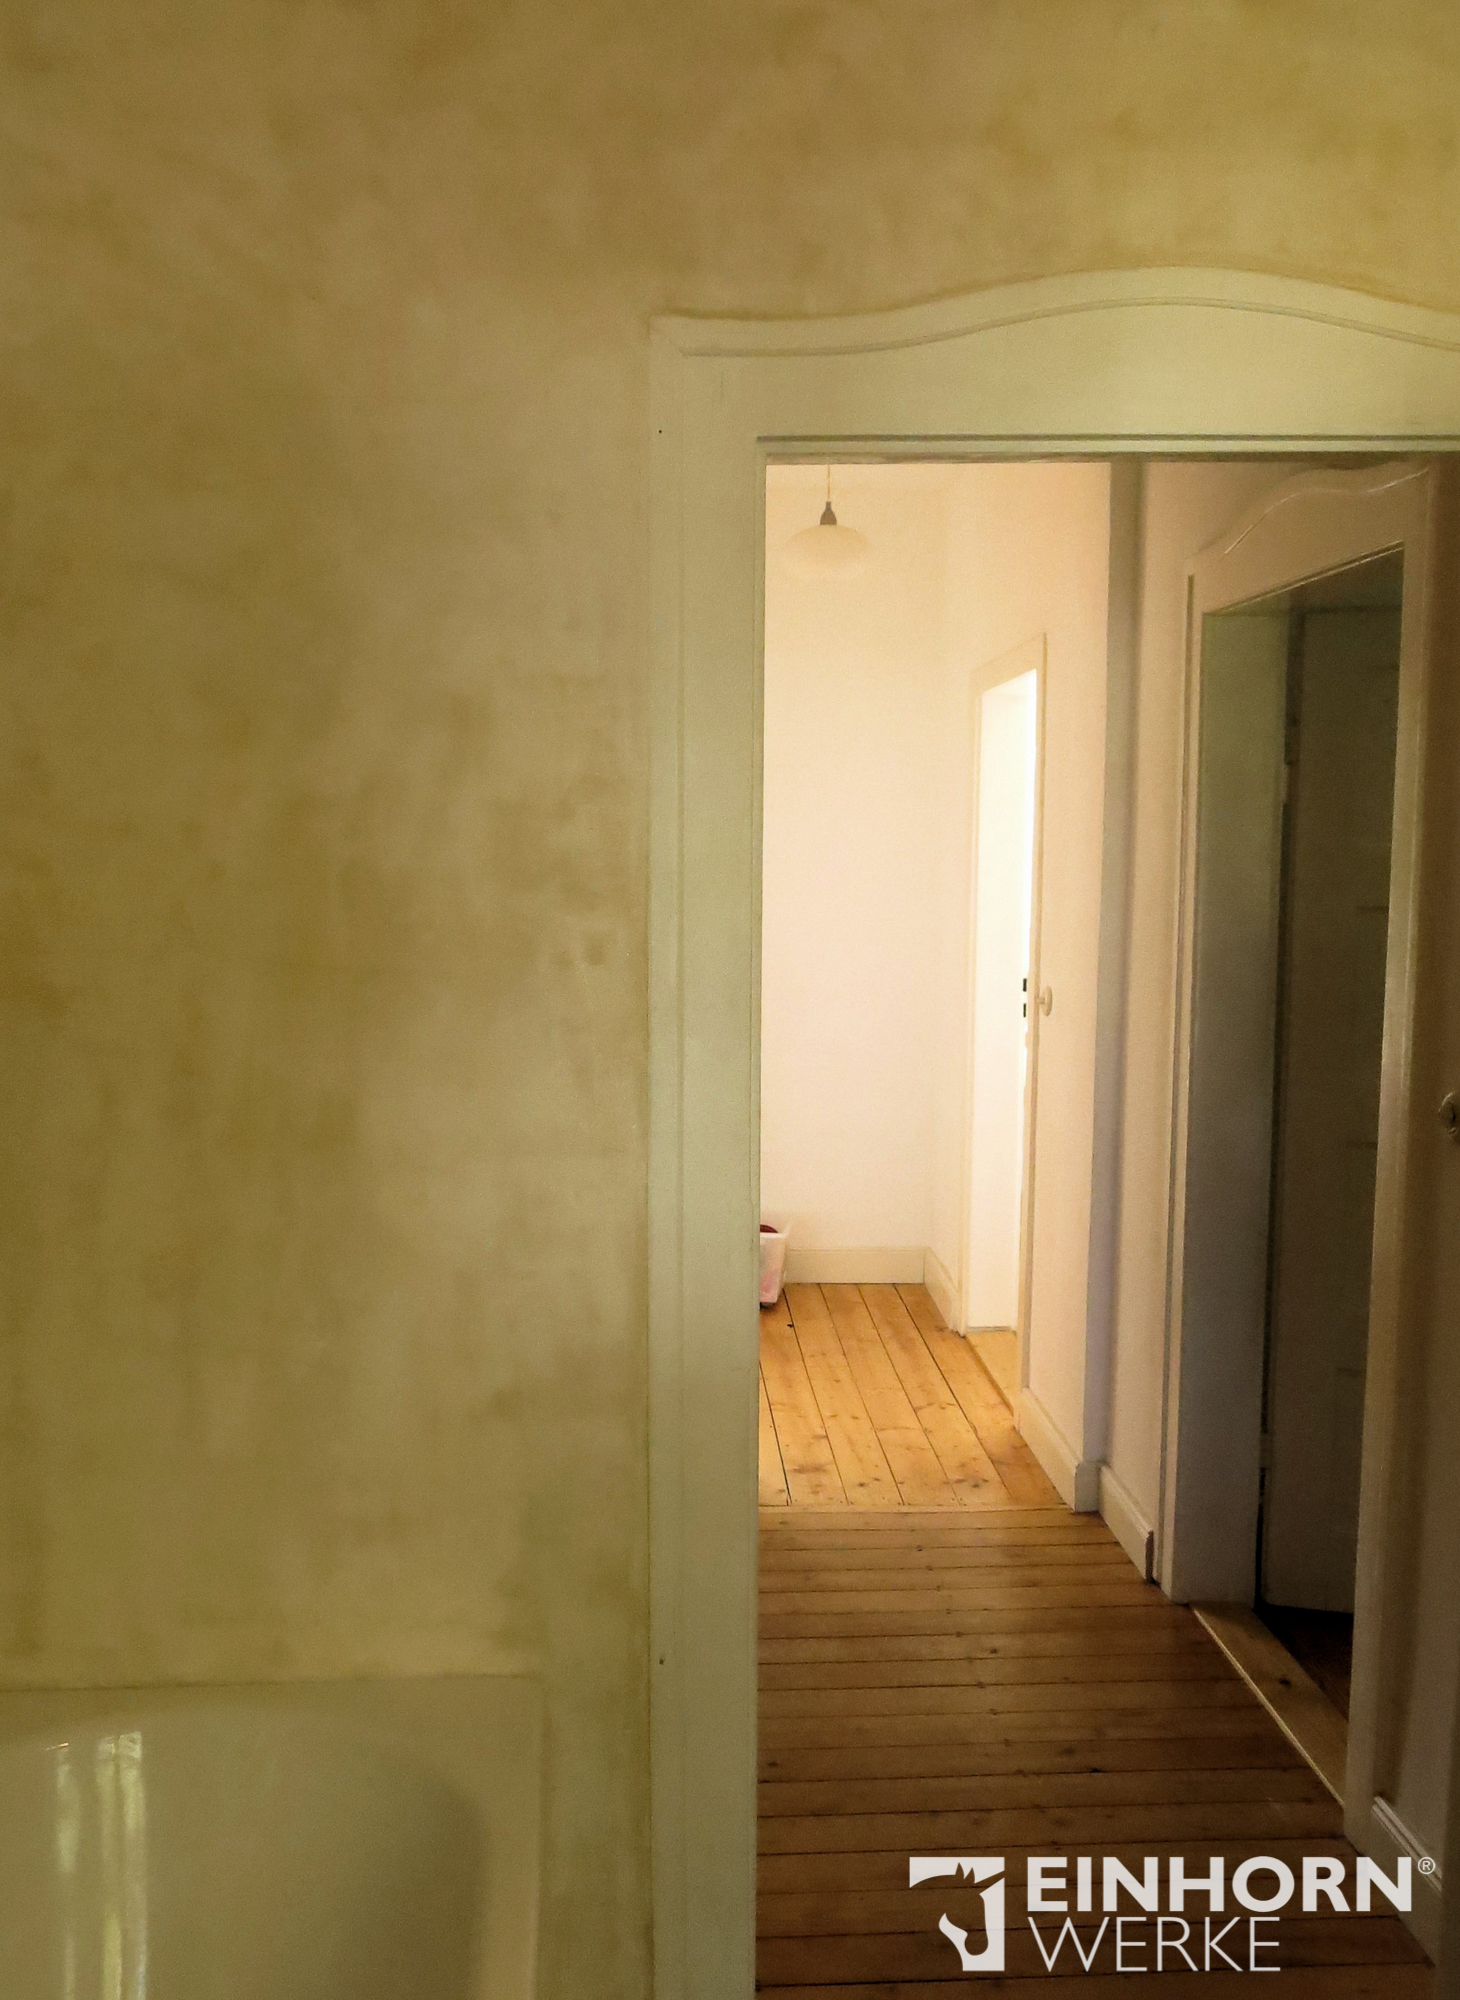 STUCCORINO 2503 + STUCCORINO Fresco Natur + EINHORN WERKE ® Imprägnierung - Wandgestaltung Badezimmer